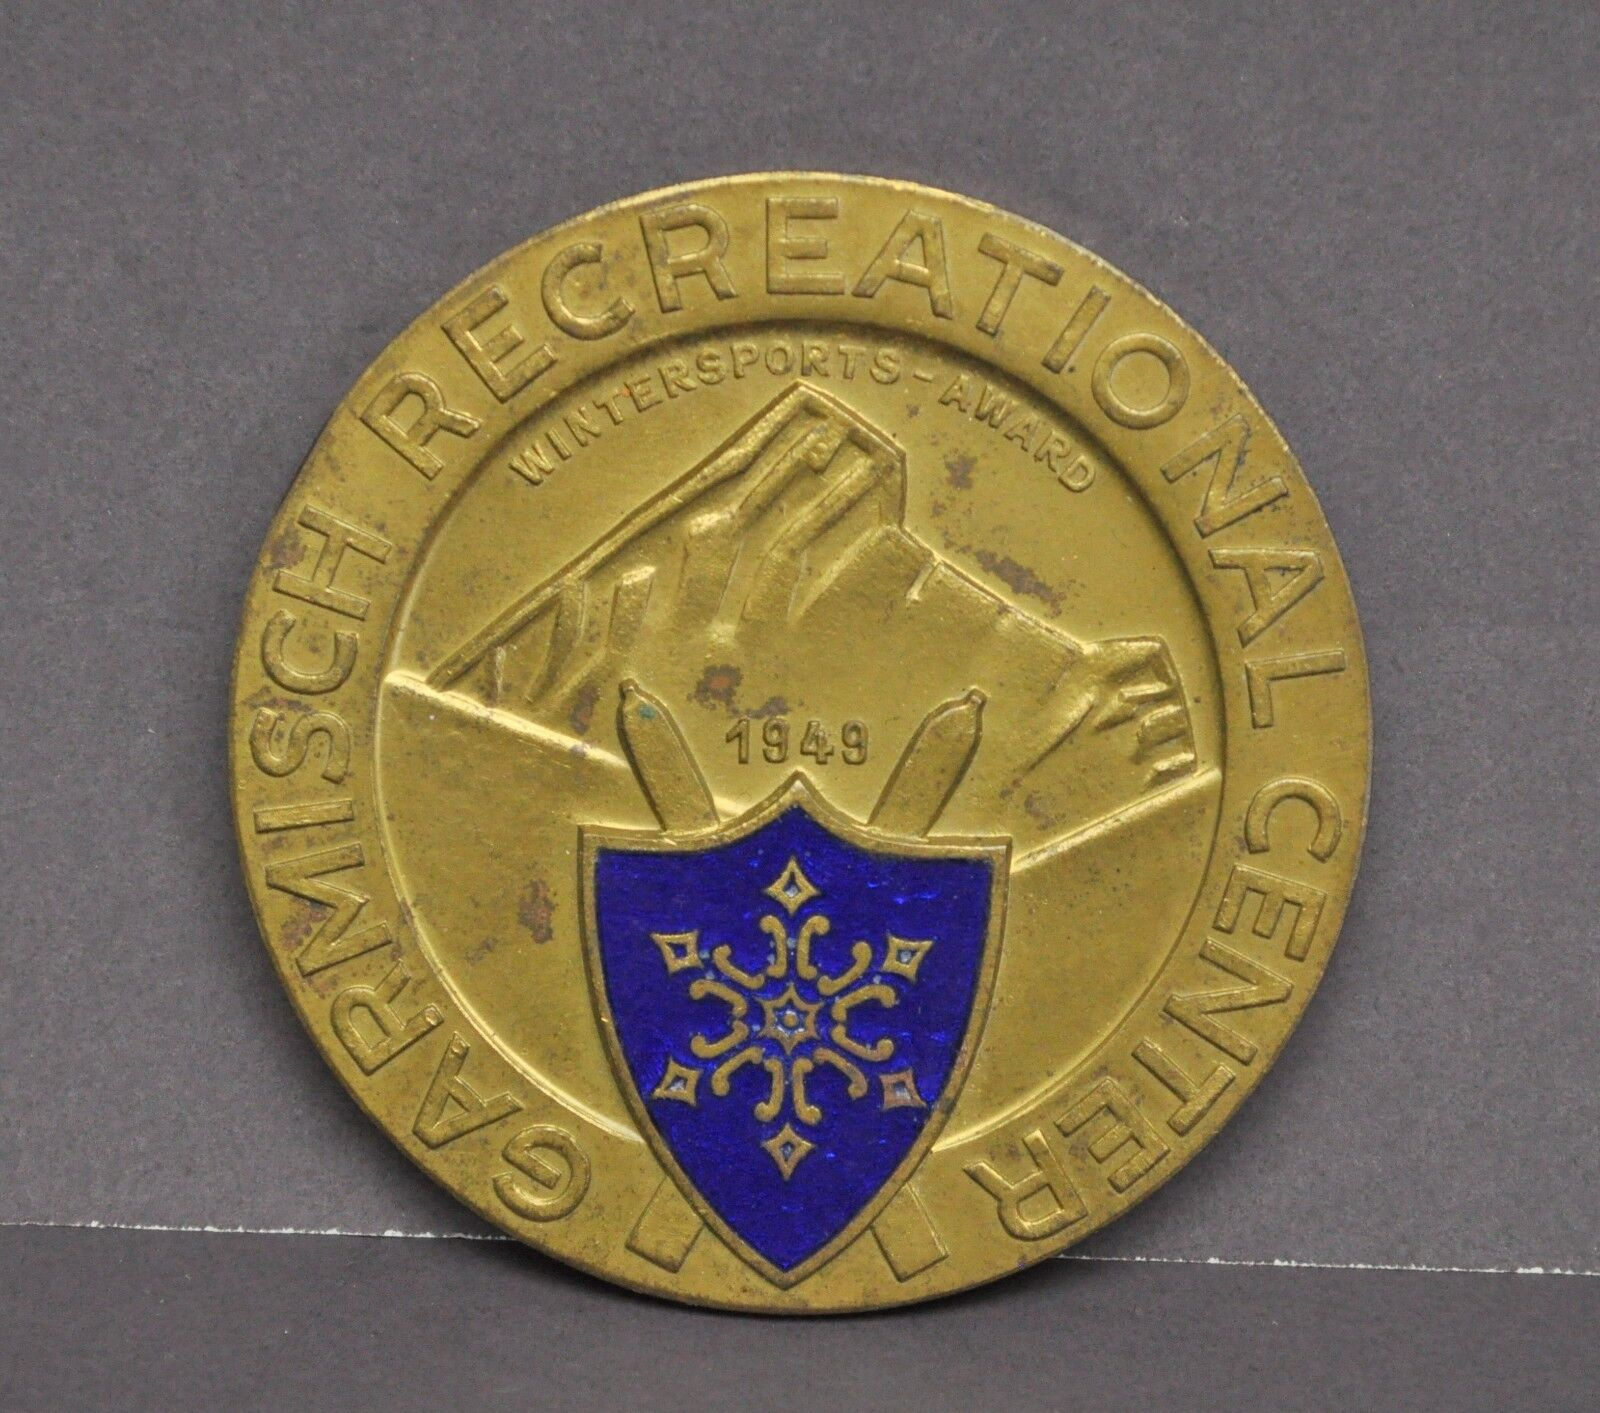 Vintage 1949 Garmisch Recreation Center Fifth Place Ski Championship Medal Award